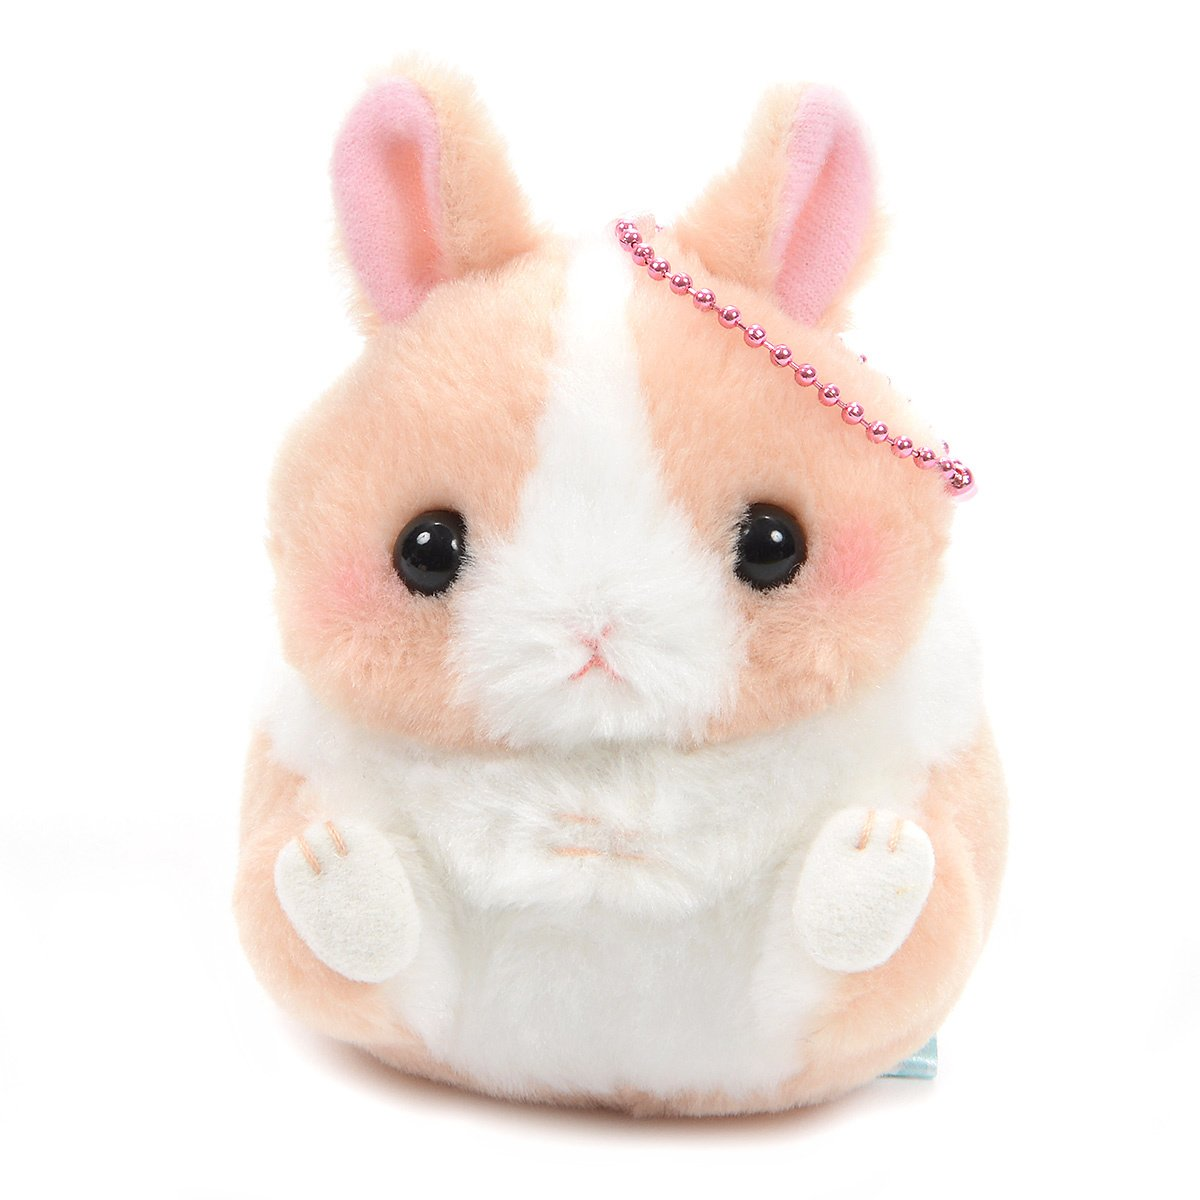 Plush Hamster, Amuse, Coroham Coron, Chibi-pyon, Mix White, 4 Inches